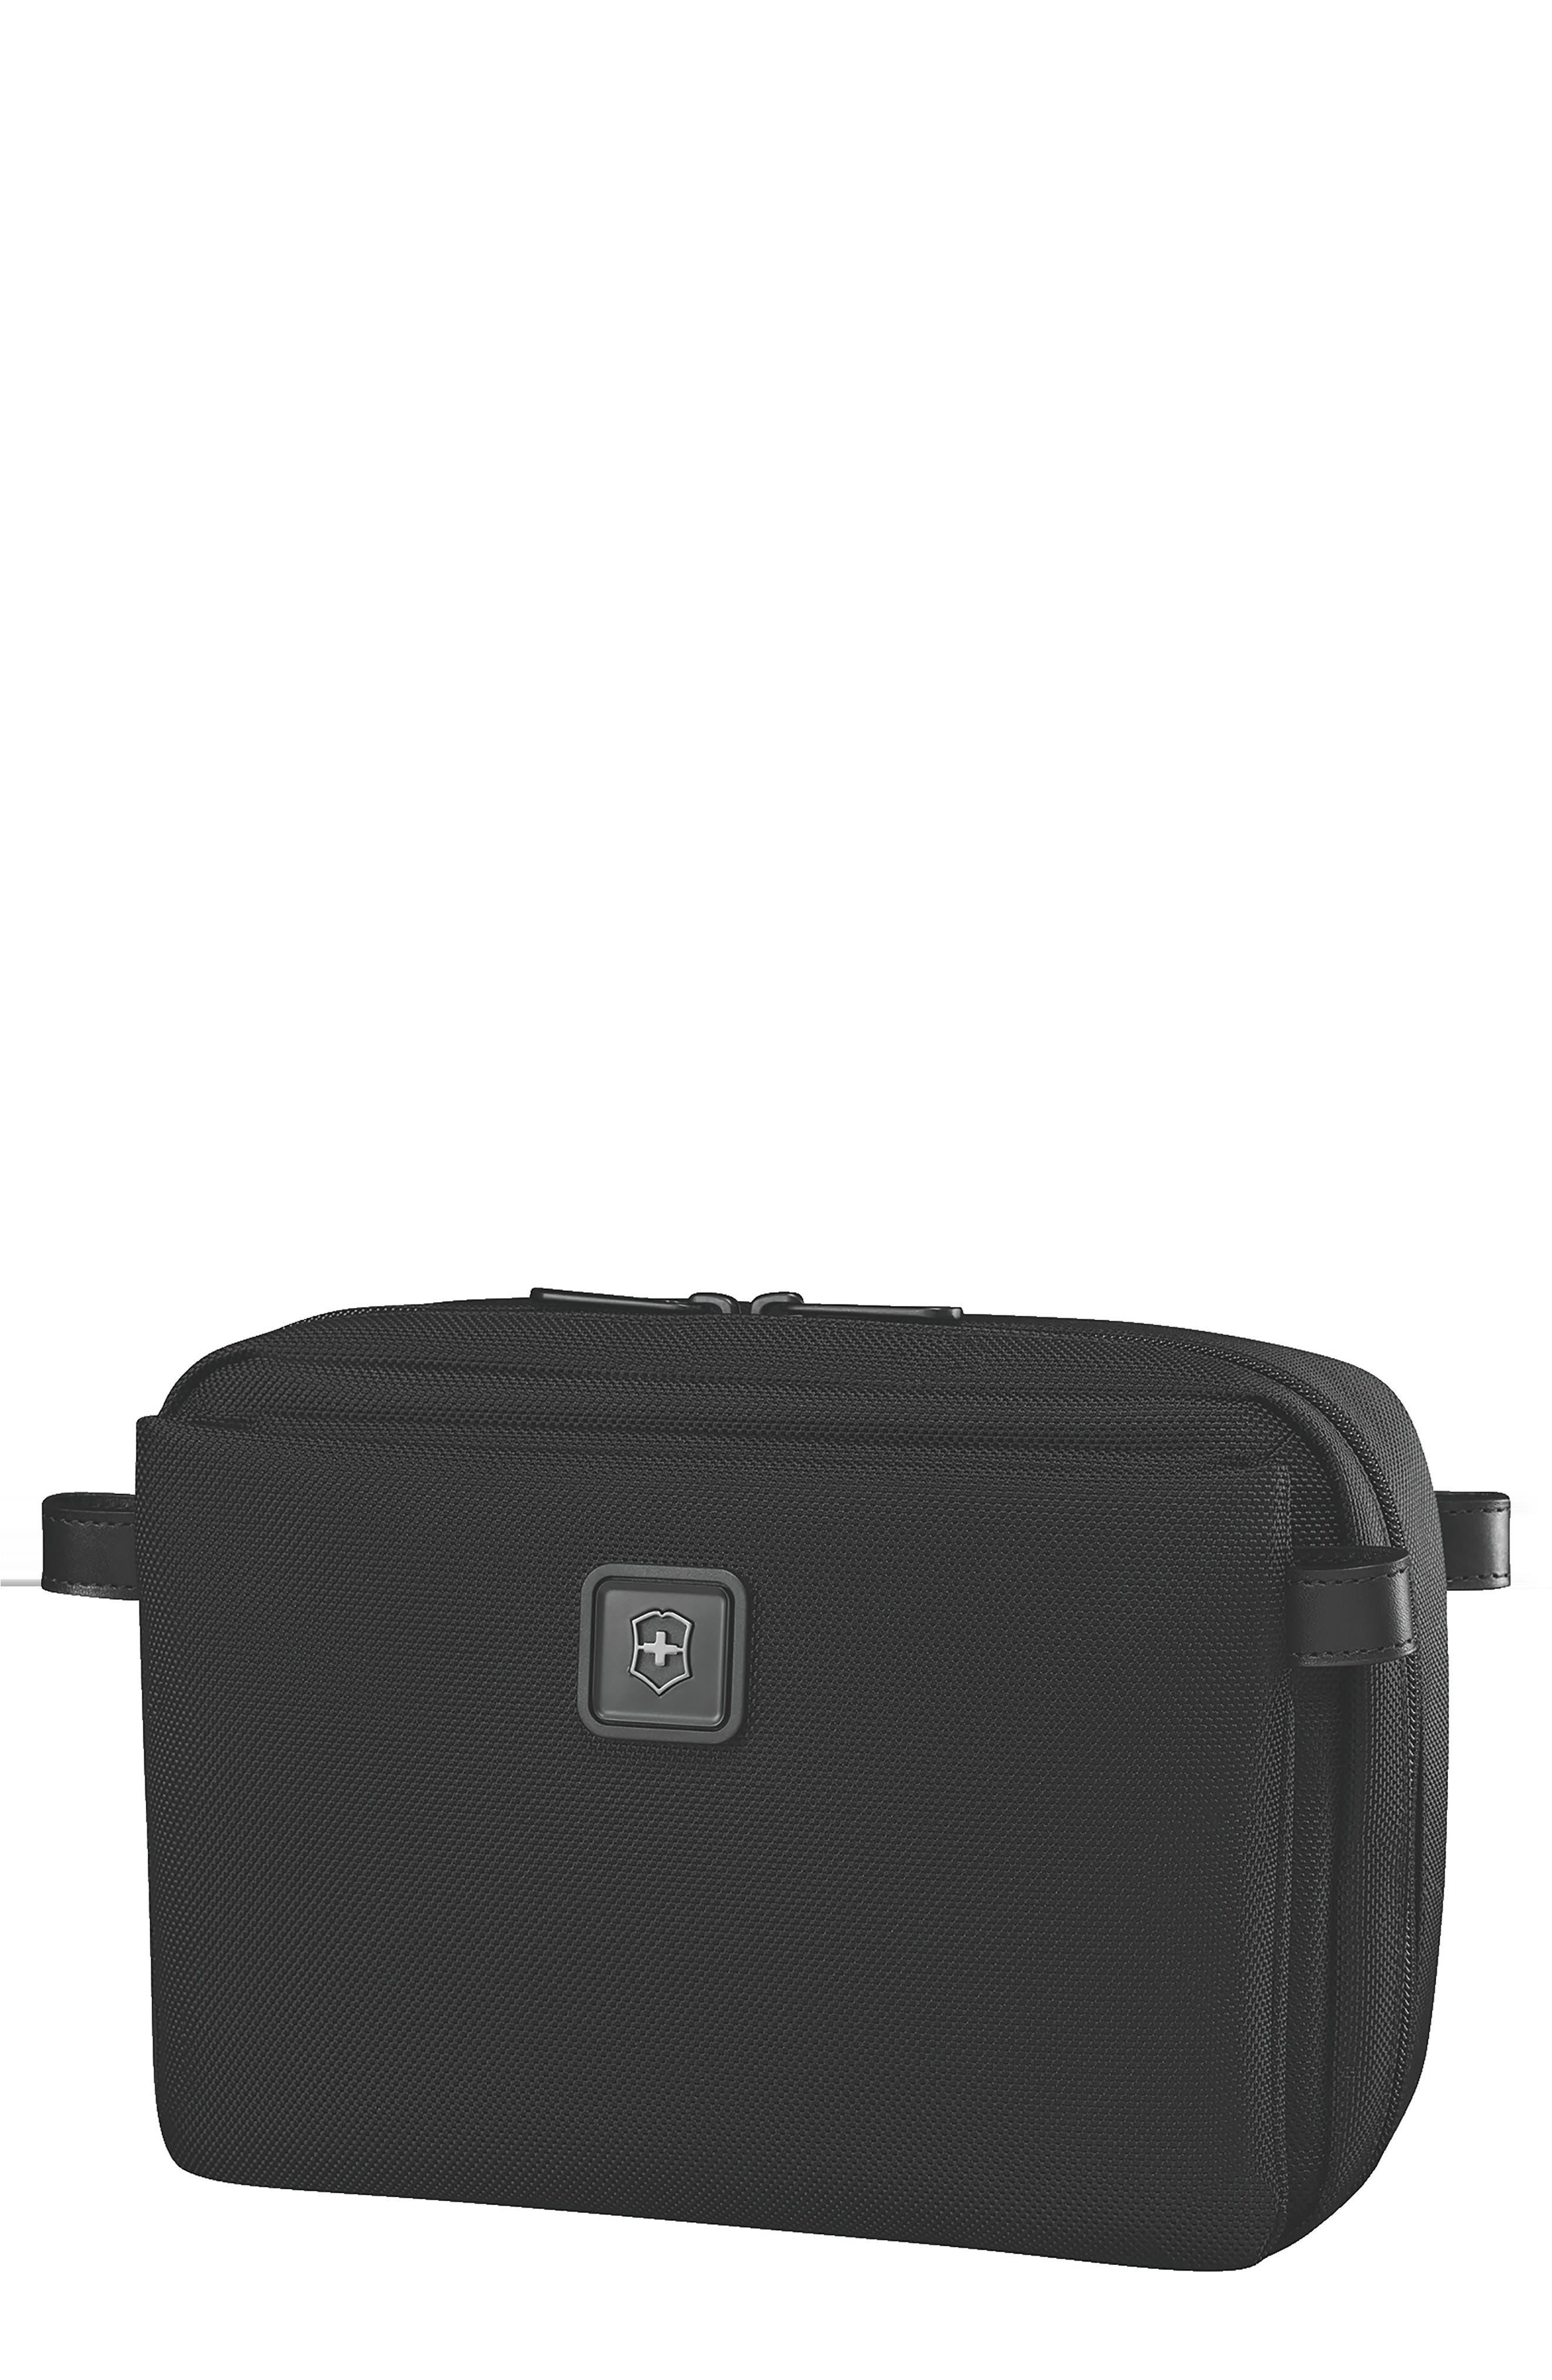 Lexicon 2.0 Travel Kit,                         Main,                         color,